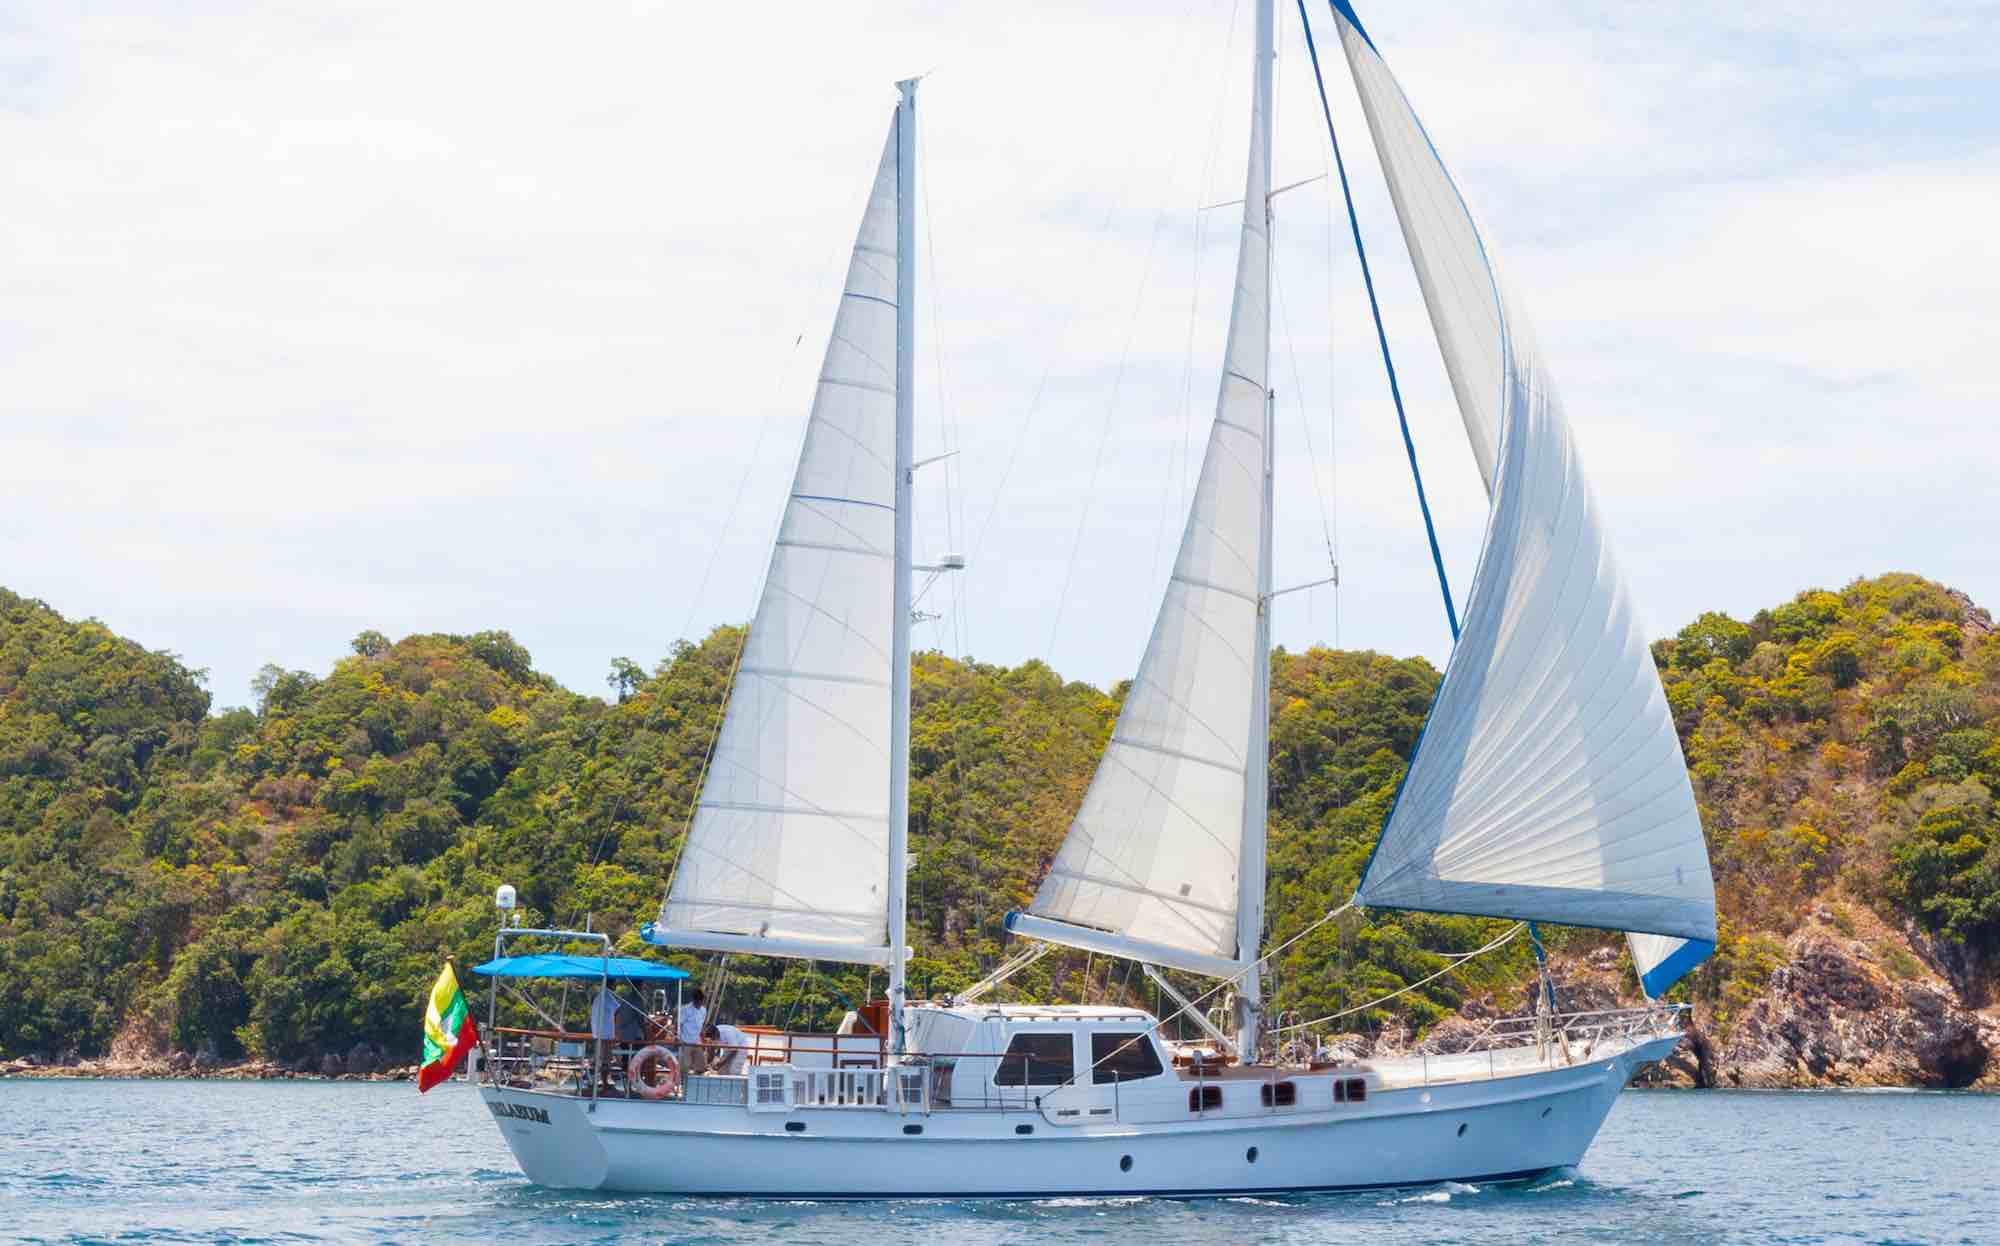 Jubilaeum_sailing along beautiful island in Mergui Archipelago_XS.jpeg